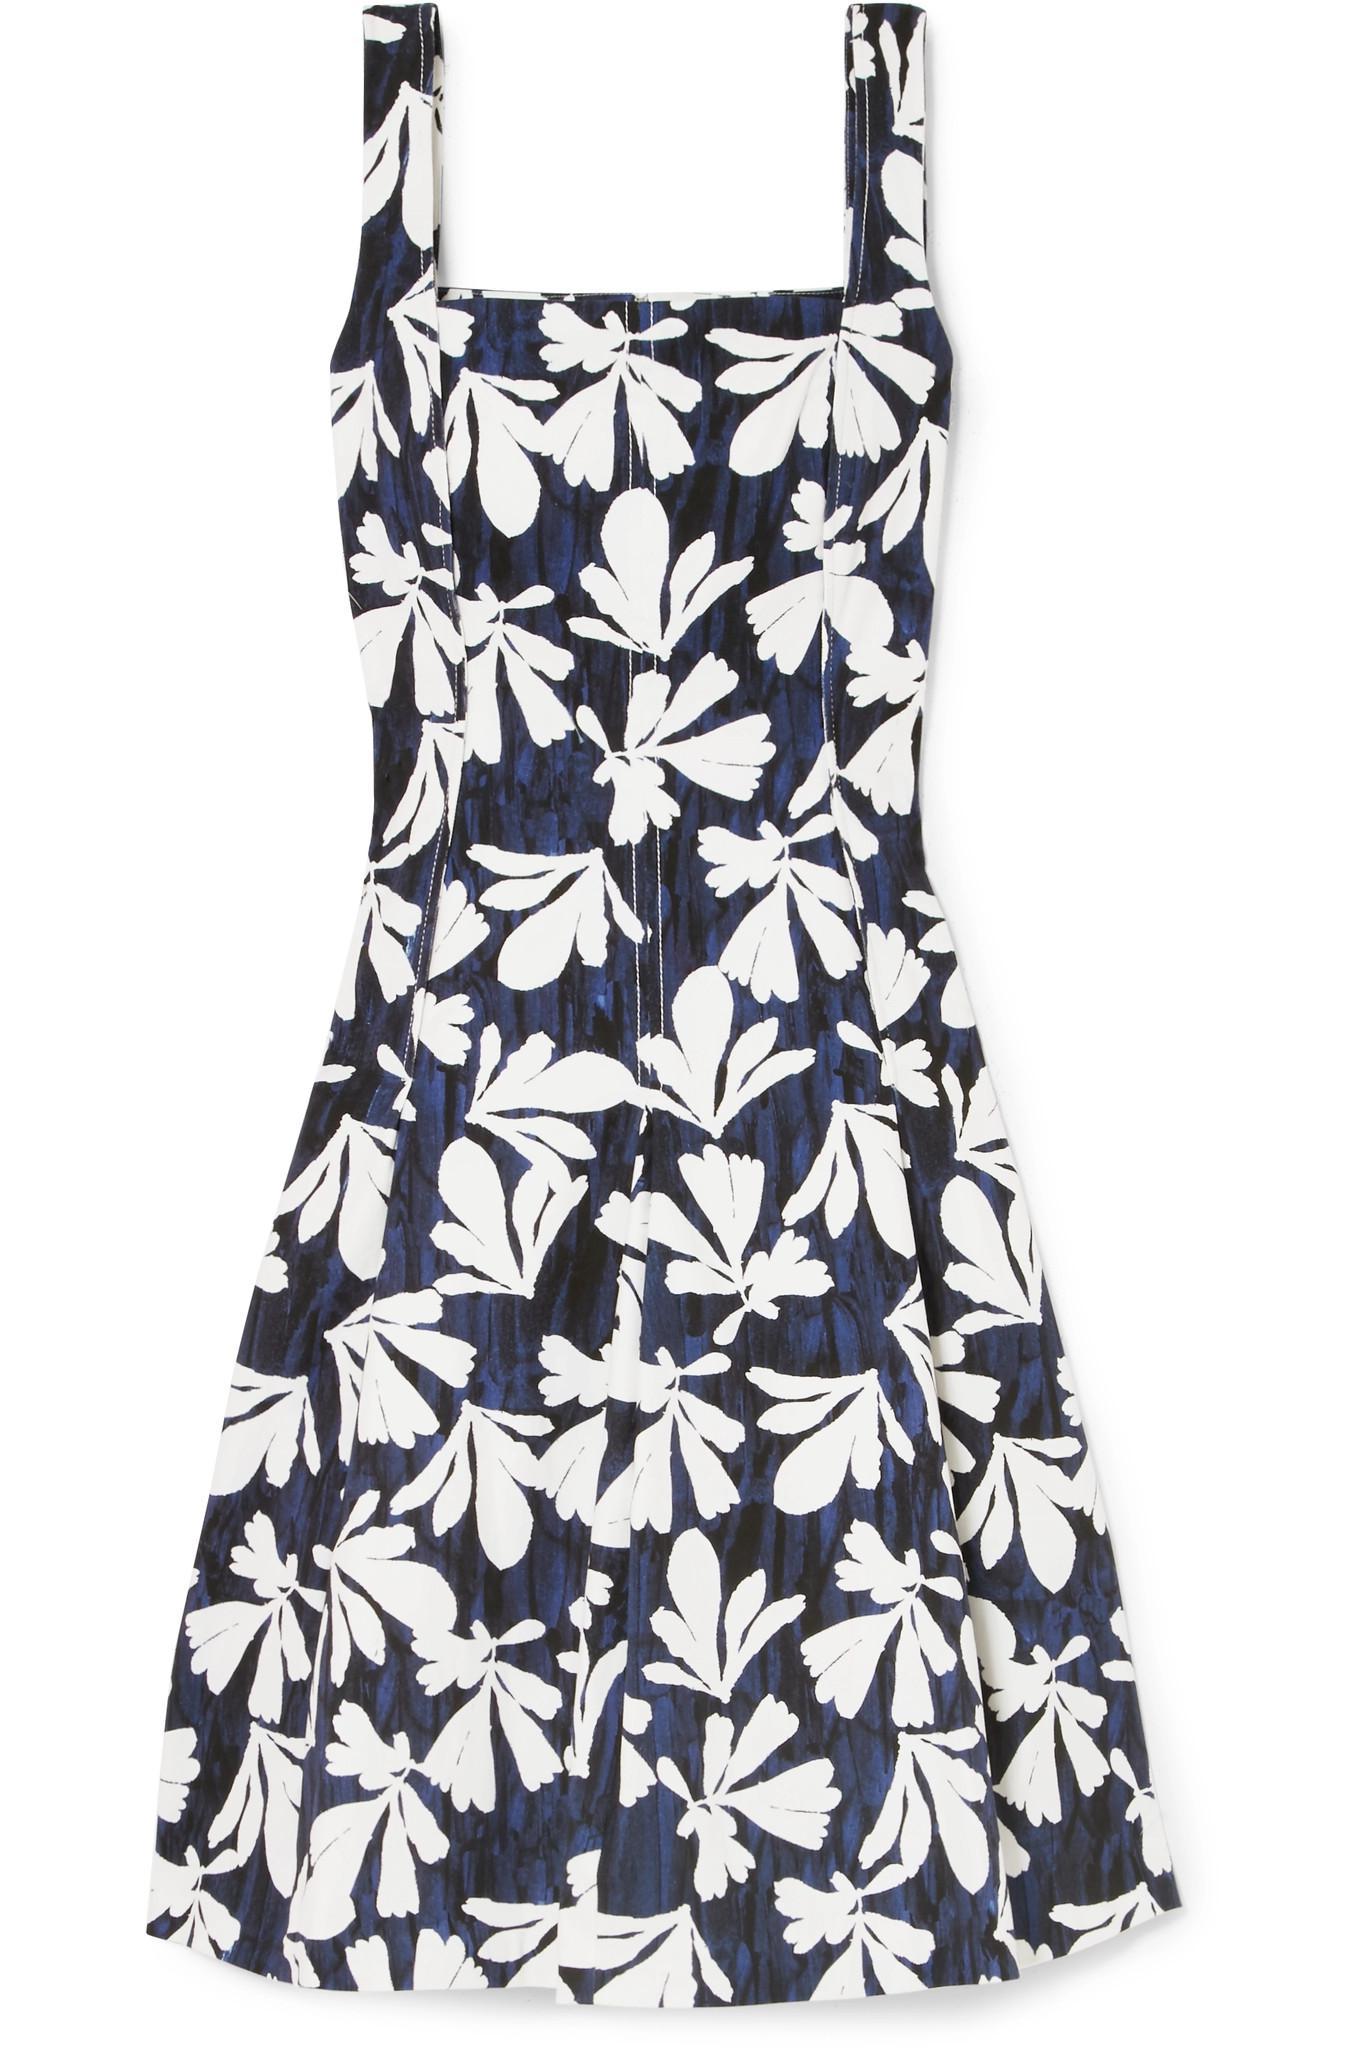 Pleated Printed Stretch-cotton Dress - Navy Oscar De La Renta Red Pre Order Eastbay Buy Online Sale Online Store For Sale Footlocker i2BsDPP